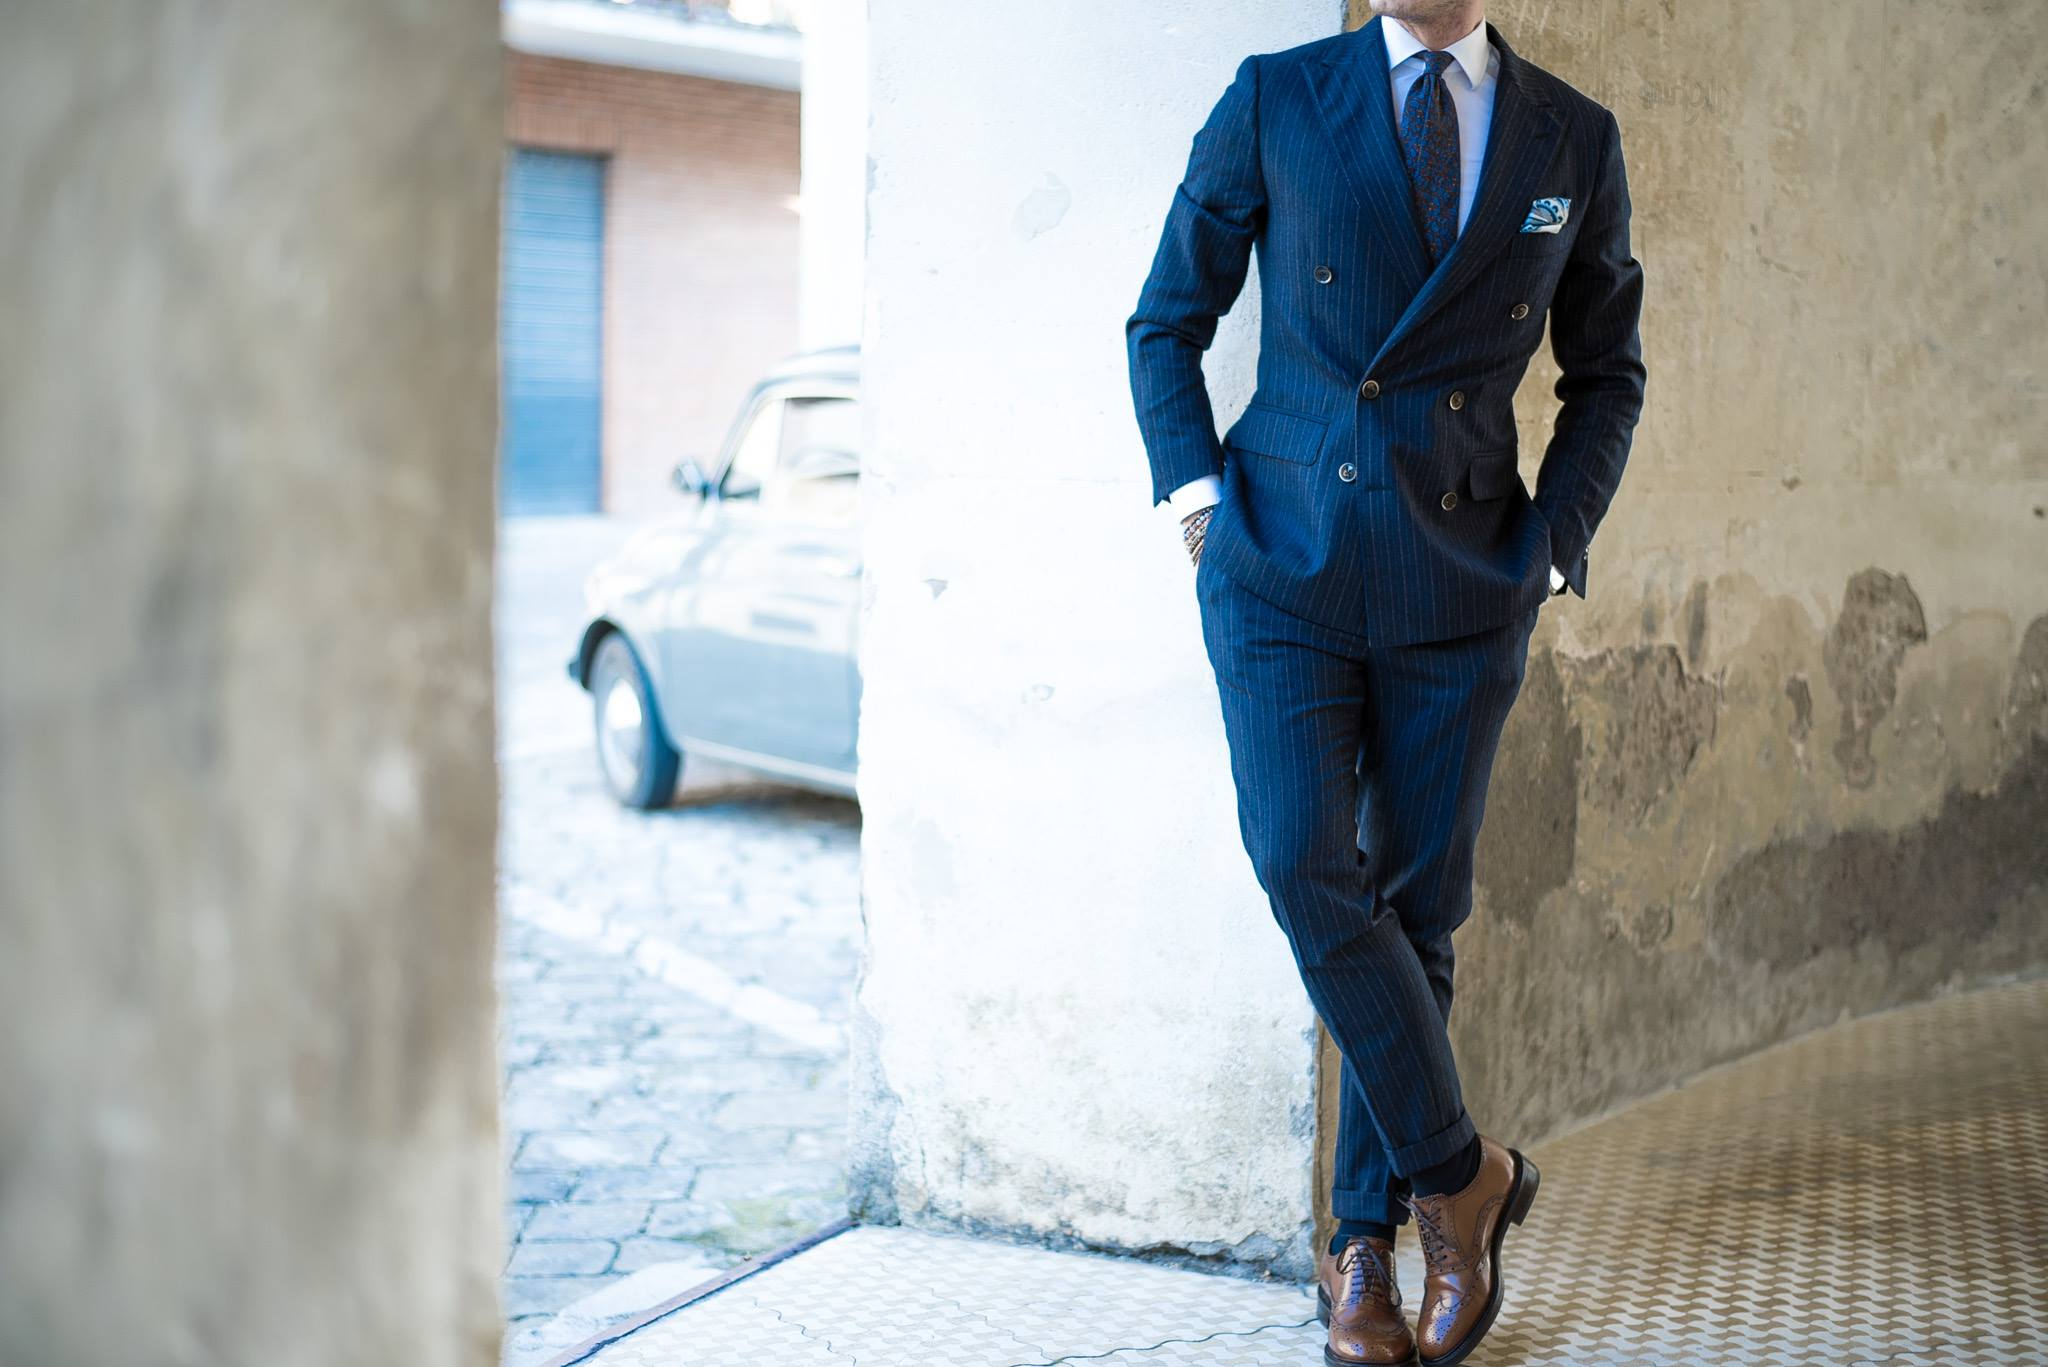 marcotaddei-marco-taddei-simplymrt-simply-mr-t-simply-mrt-fashion-blogger-uomo-fashionblogger-menswear-gentleman-outfit-instagram-eleganza-maschile